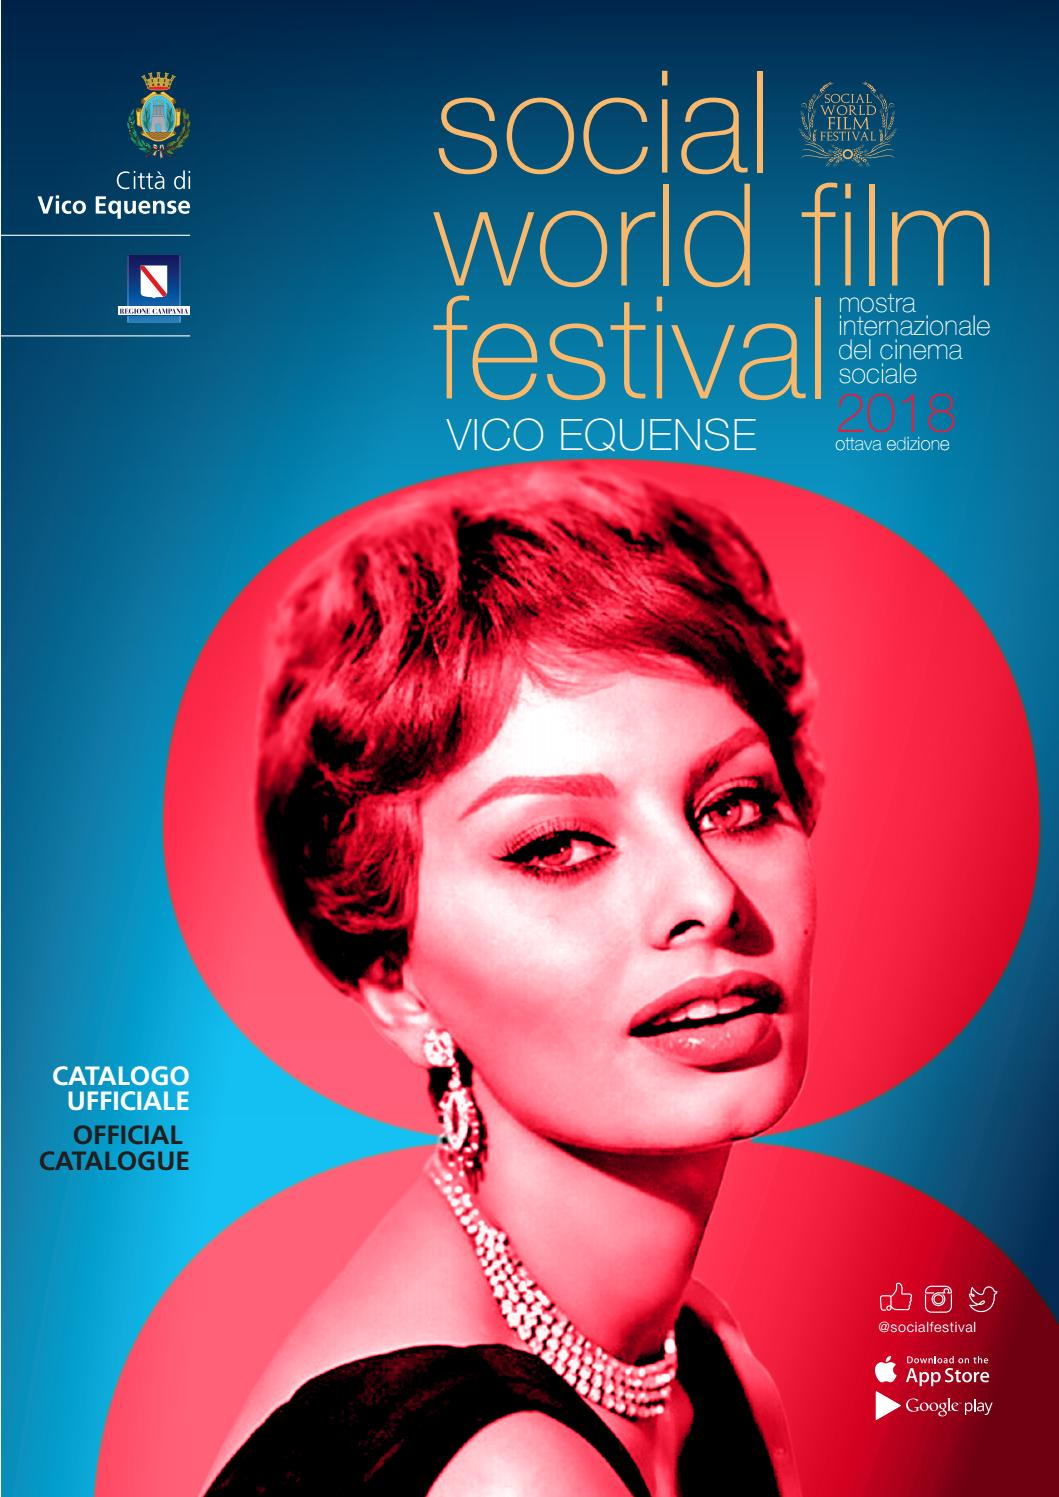 Social World Film Festival Catalogo 2018 By Aficfestival Issuu